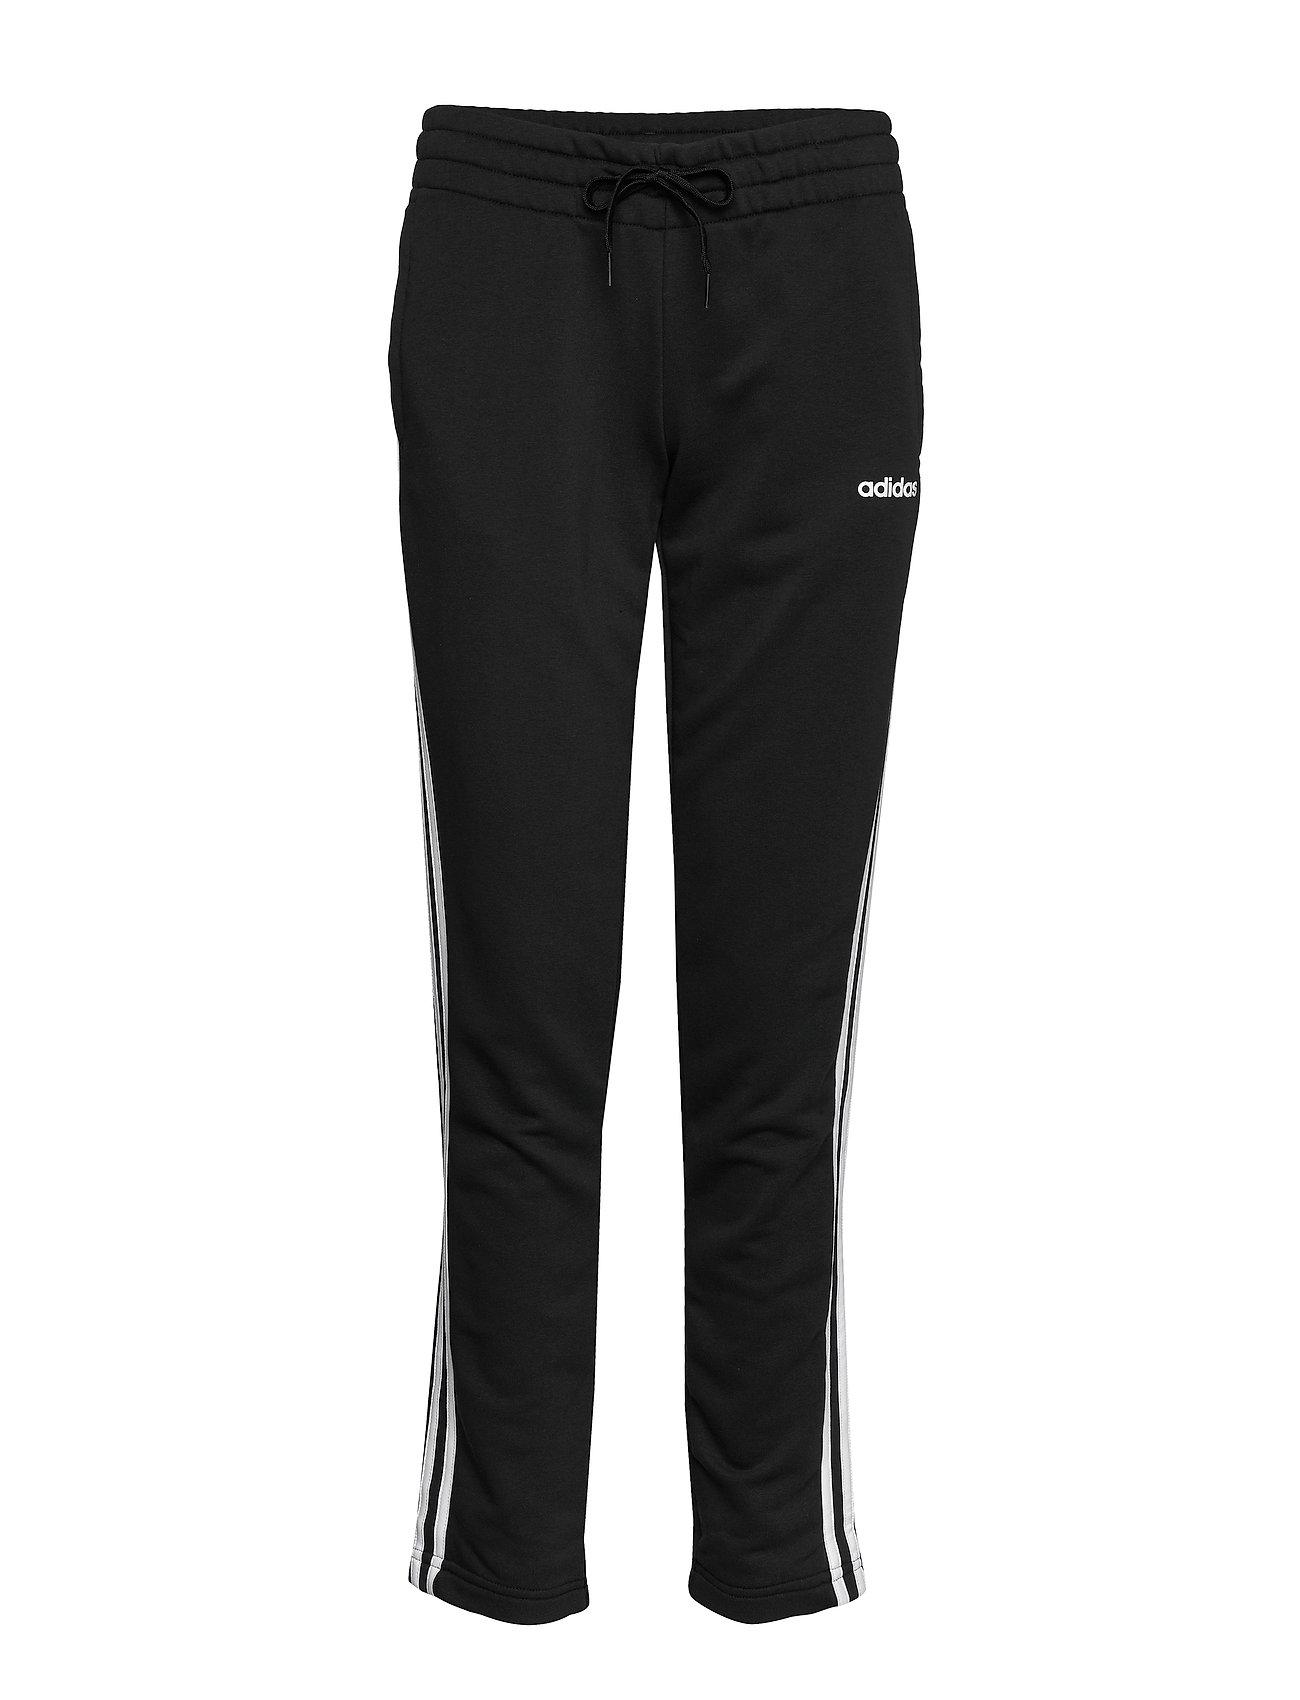 adidas Performance W E 3S PANT OH - BLACK/WHITE